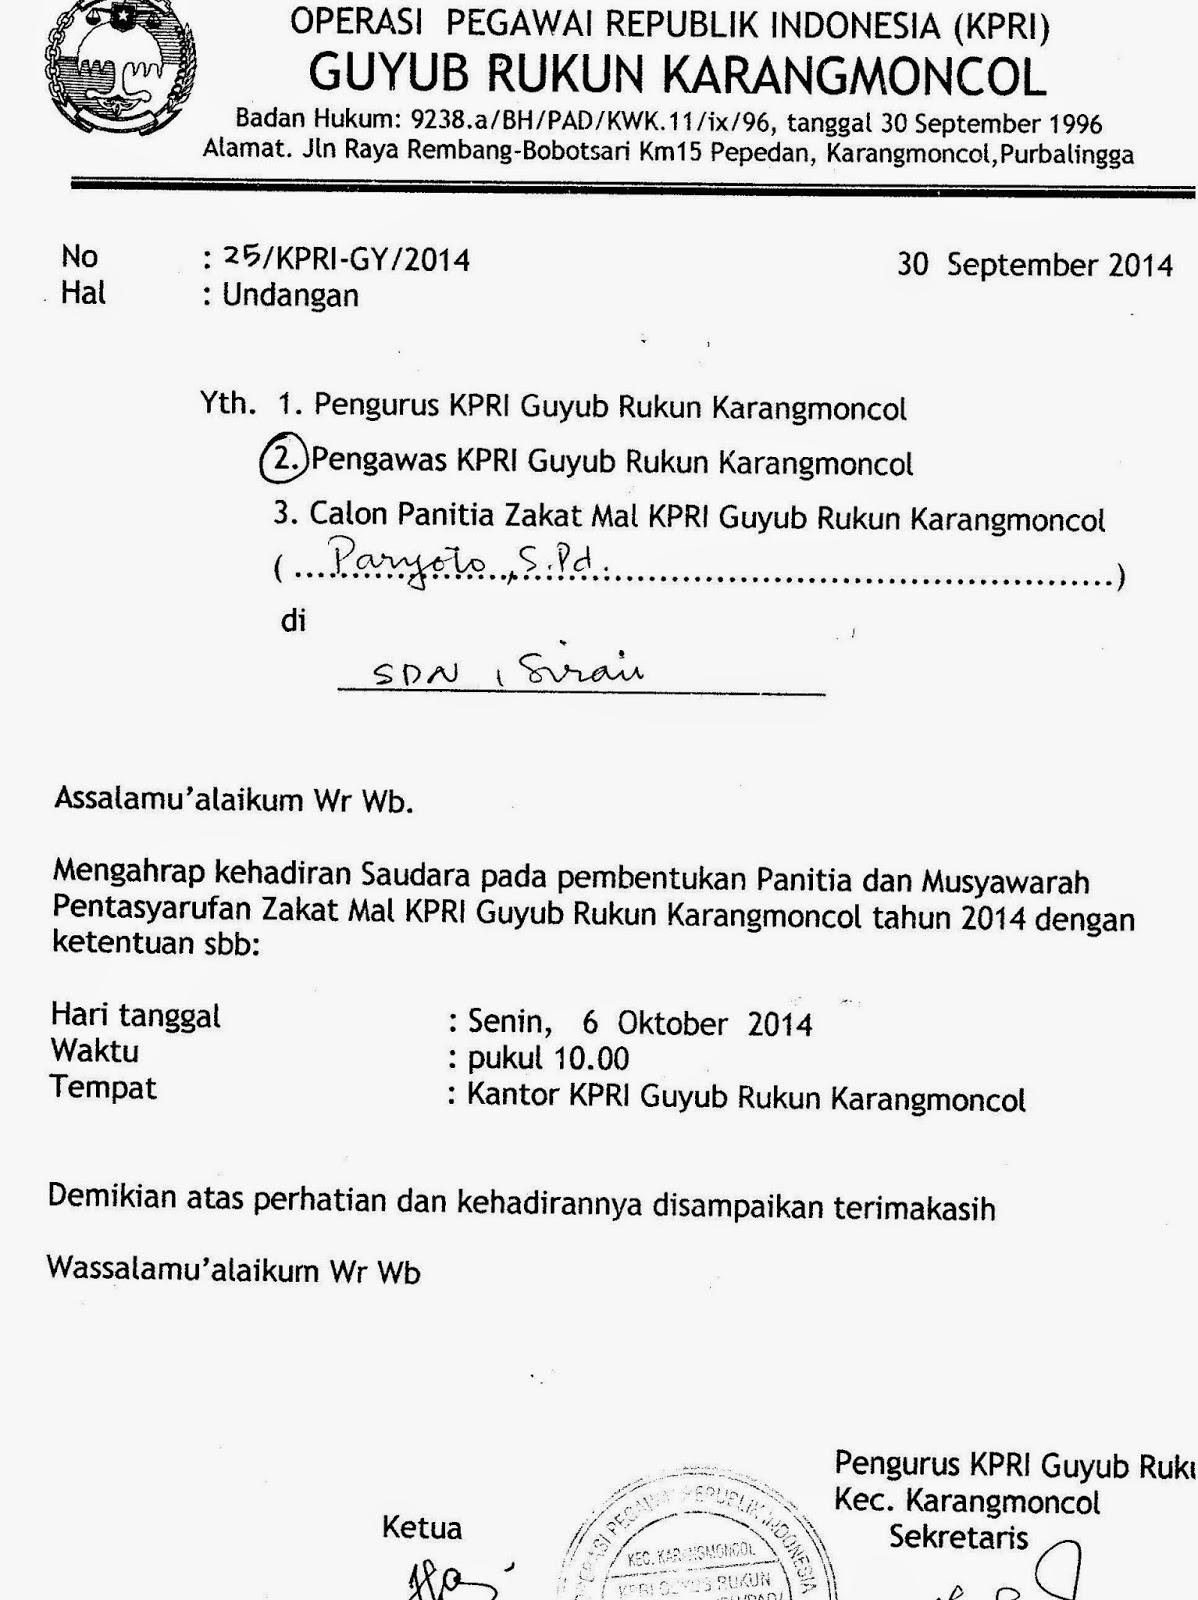 Arsip Sdn 1 Sirau Surat Undangan Calon Panitia Zakat Mal Koperasi